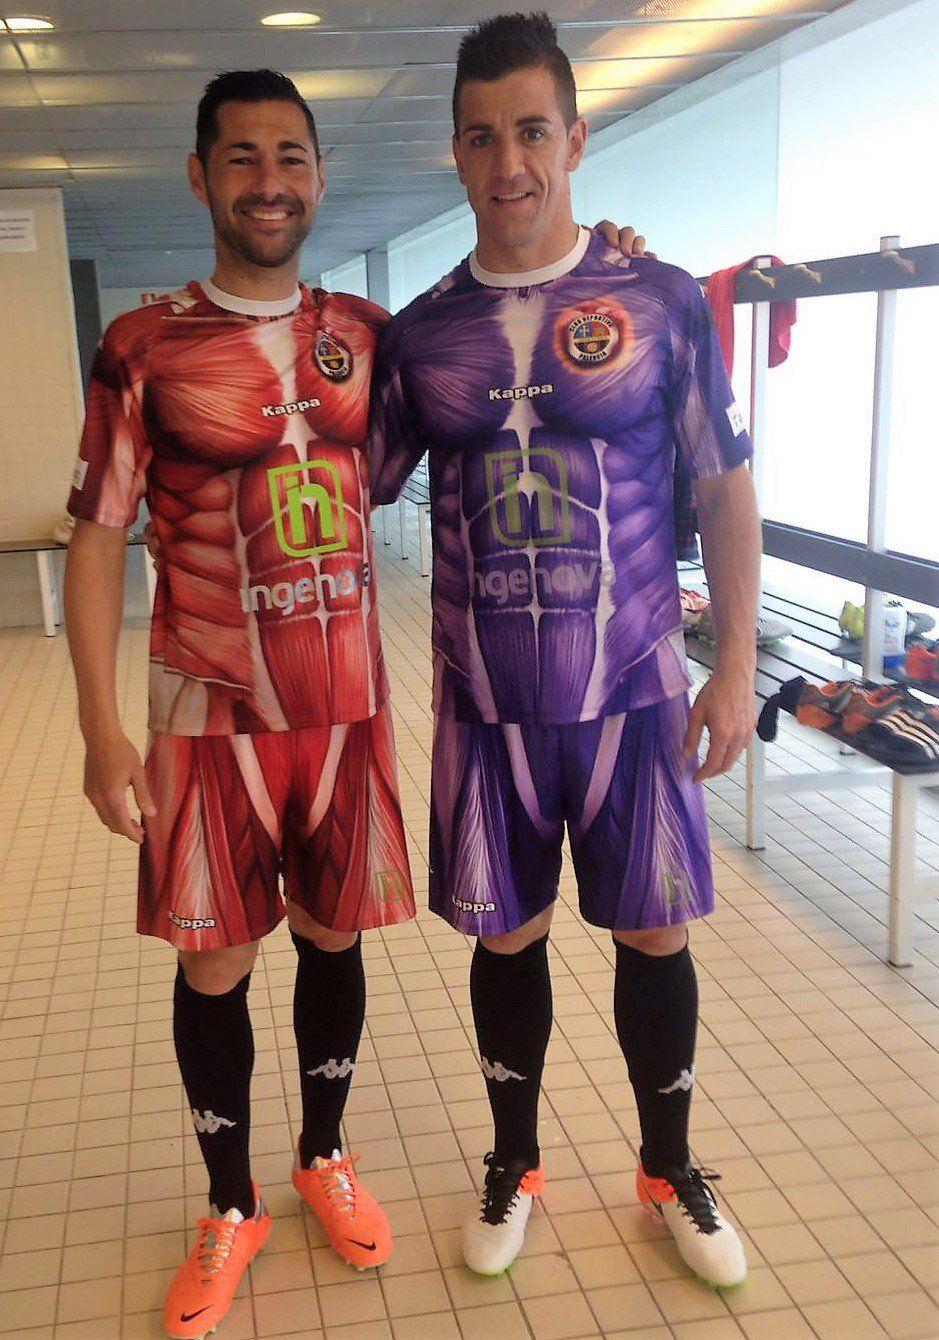 Club Deportivo Palencia presenting the weirdest jerseys I